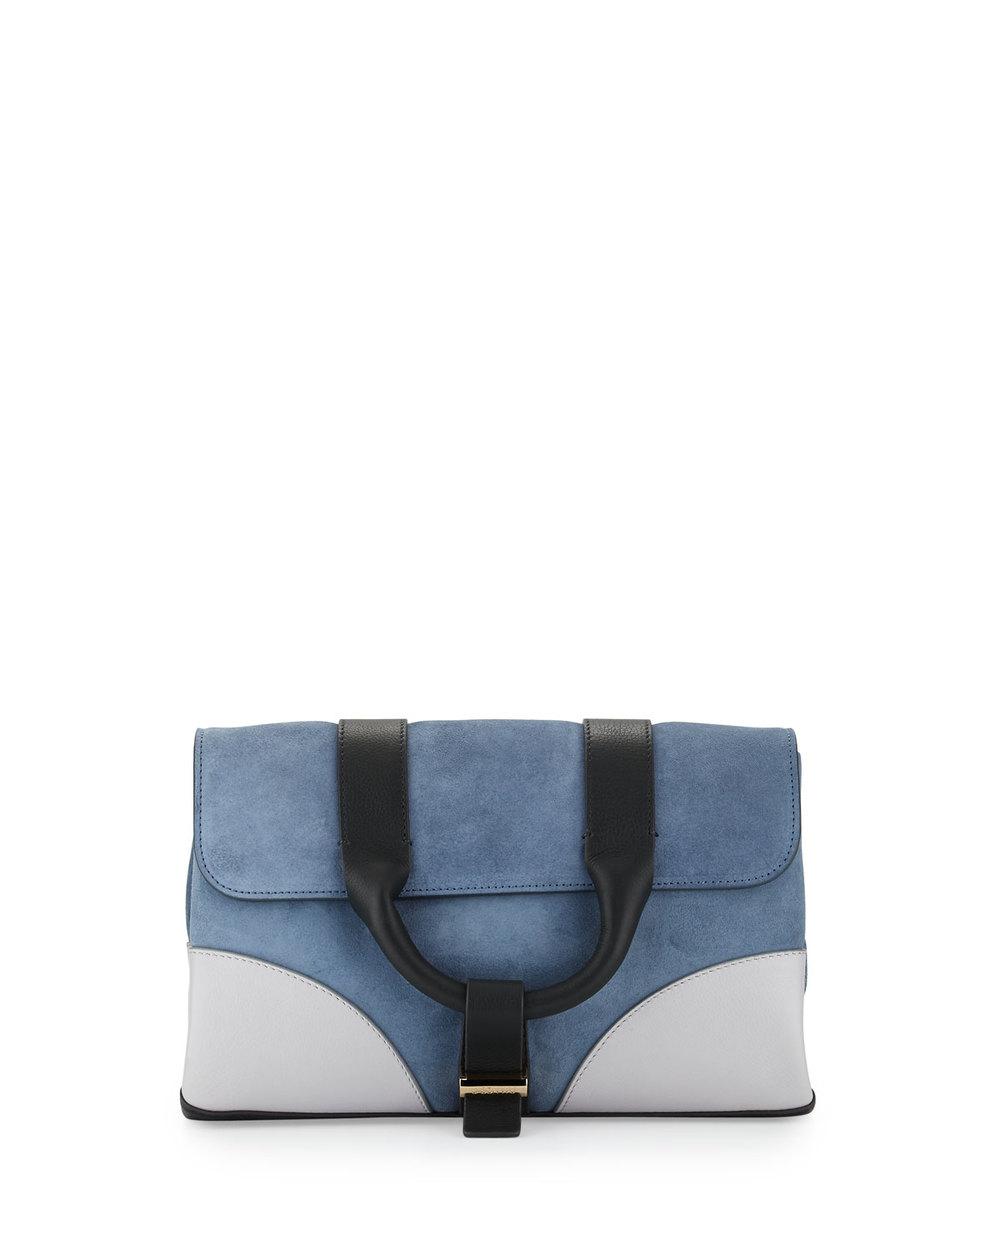 Jason Wu Hanne Suede & Leather Clutch Bag, Dark Plexi • $536.80 • Neiman Marcus